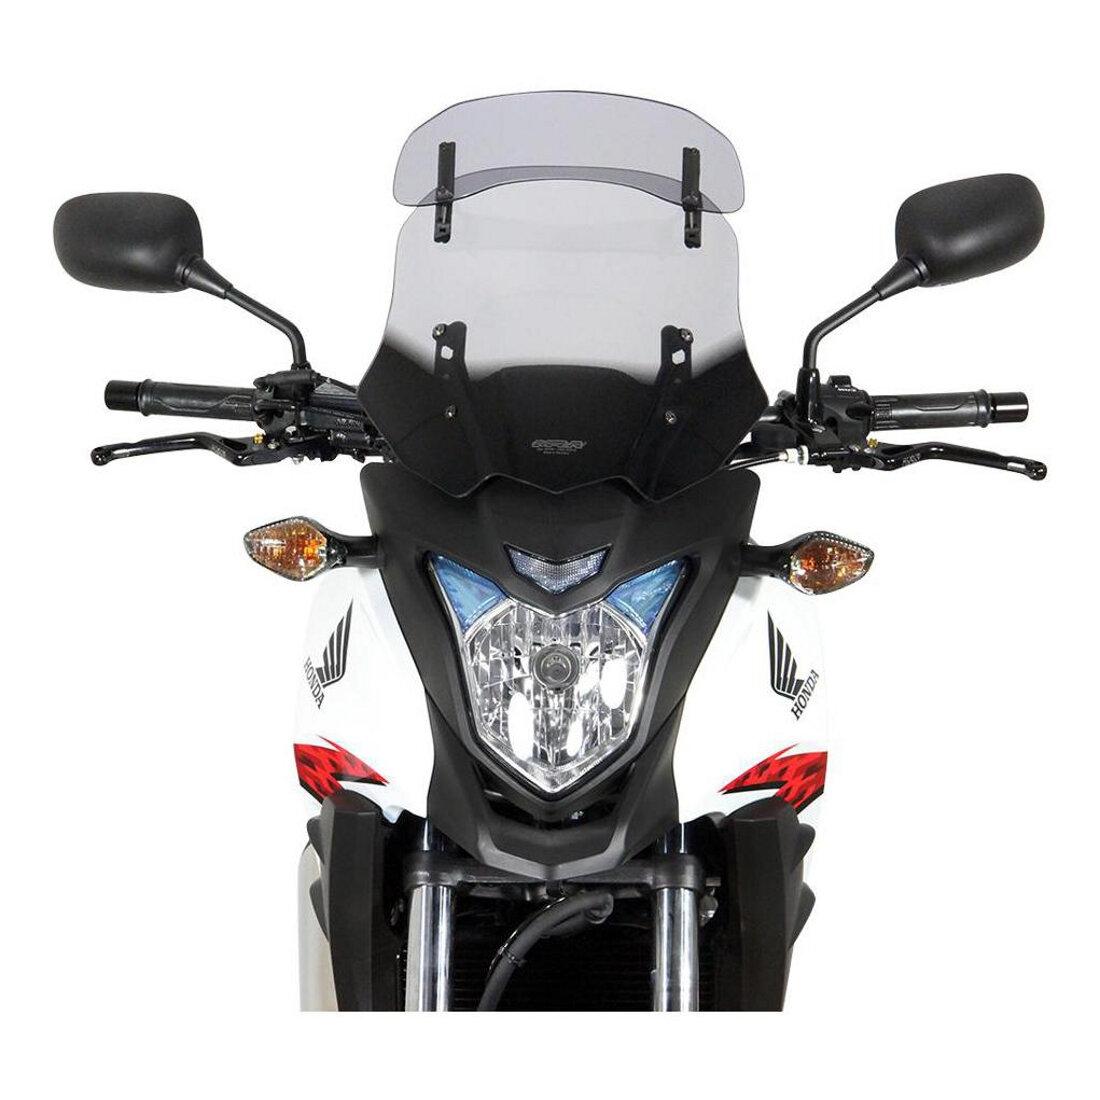 Pare-brise MRA Vario Touring fumé Honda CB 500 X 13-15